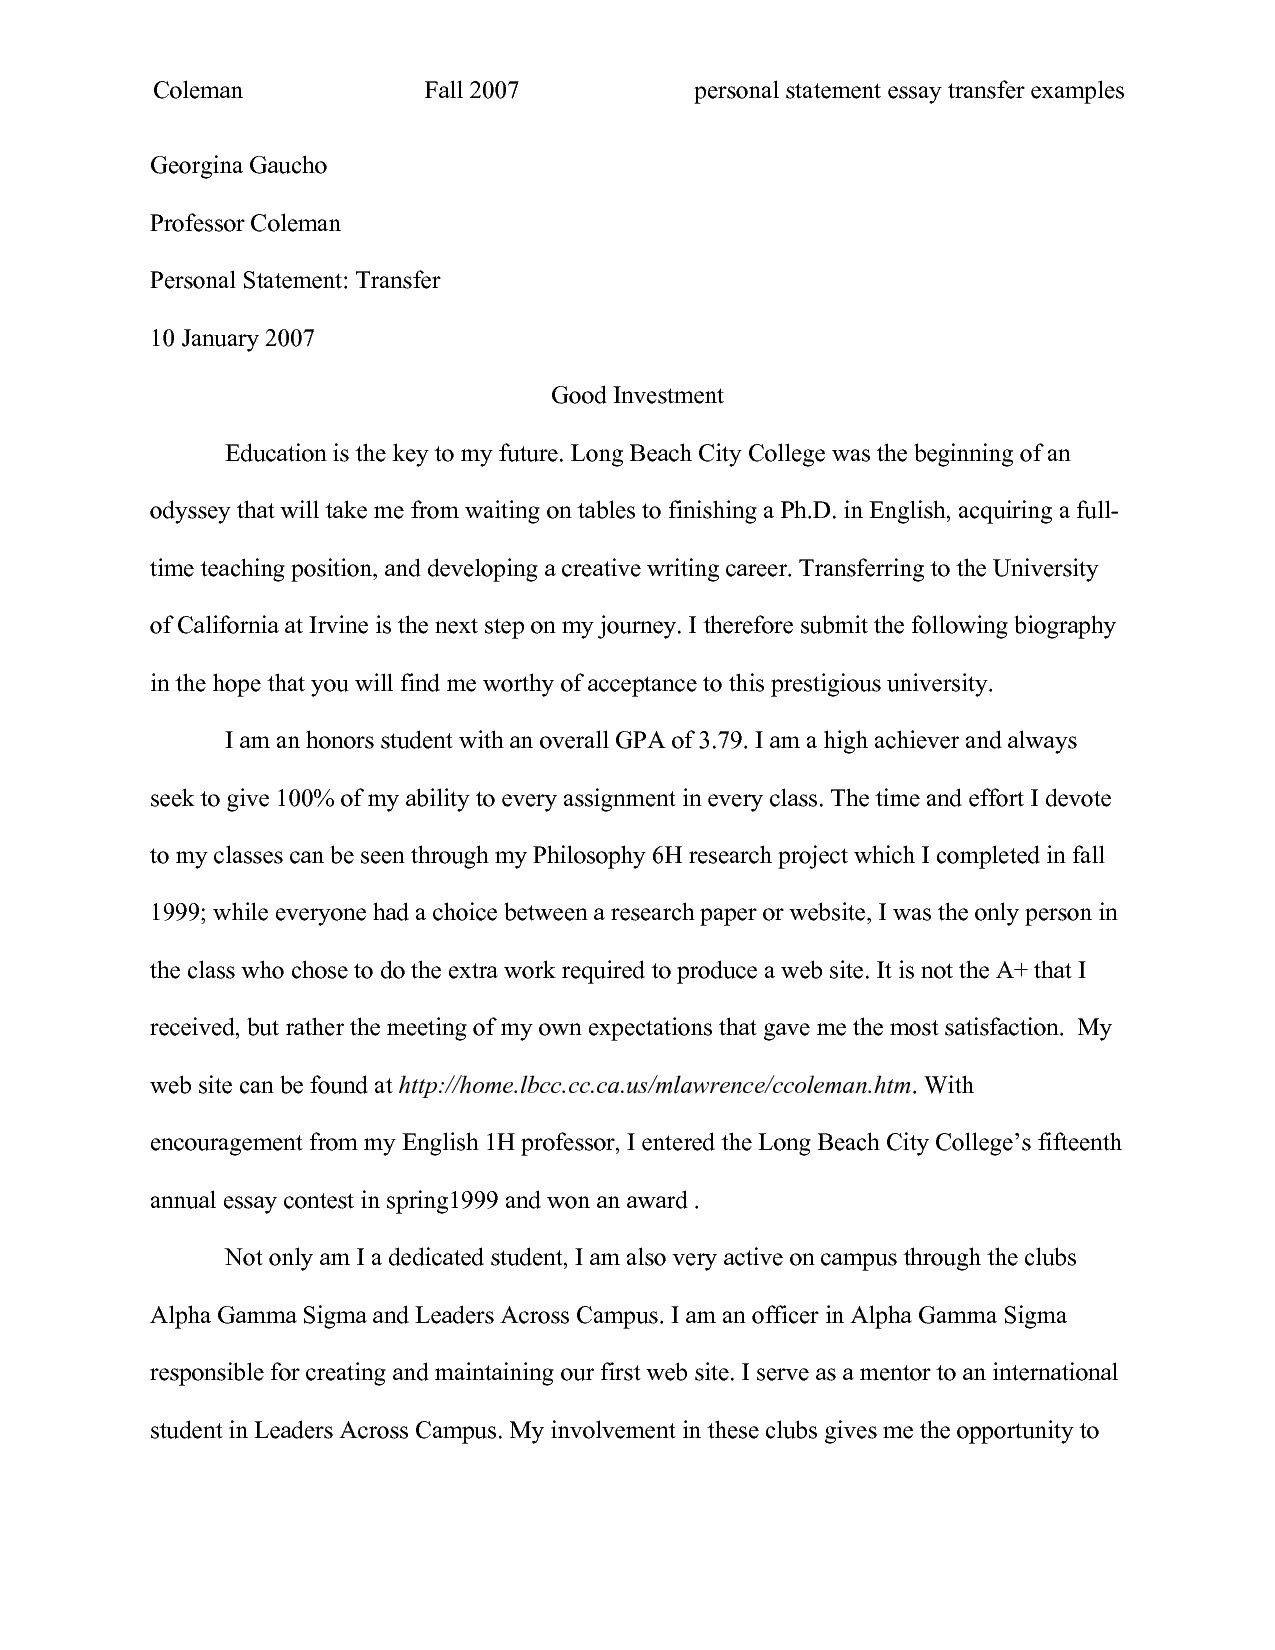 Natural disasters essay writing